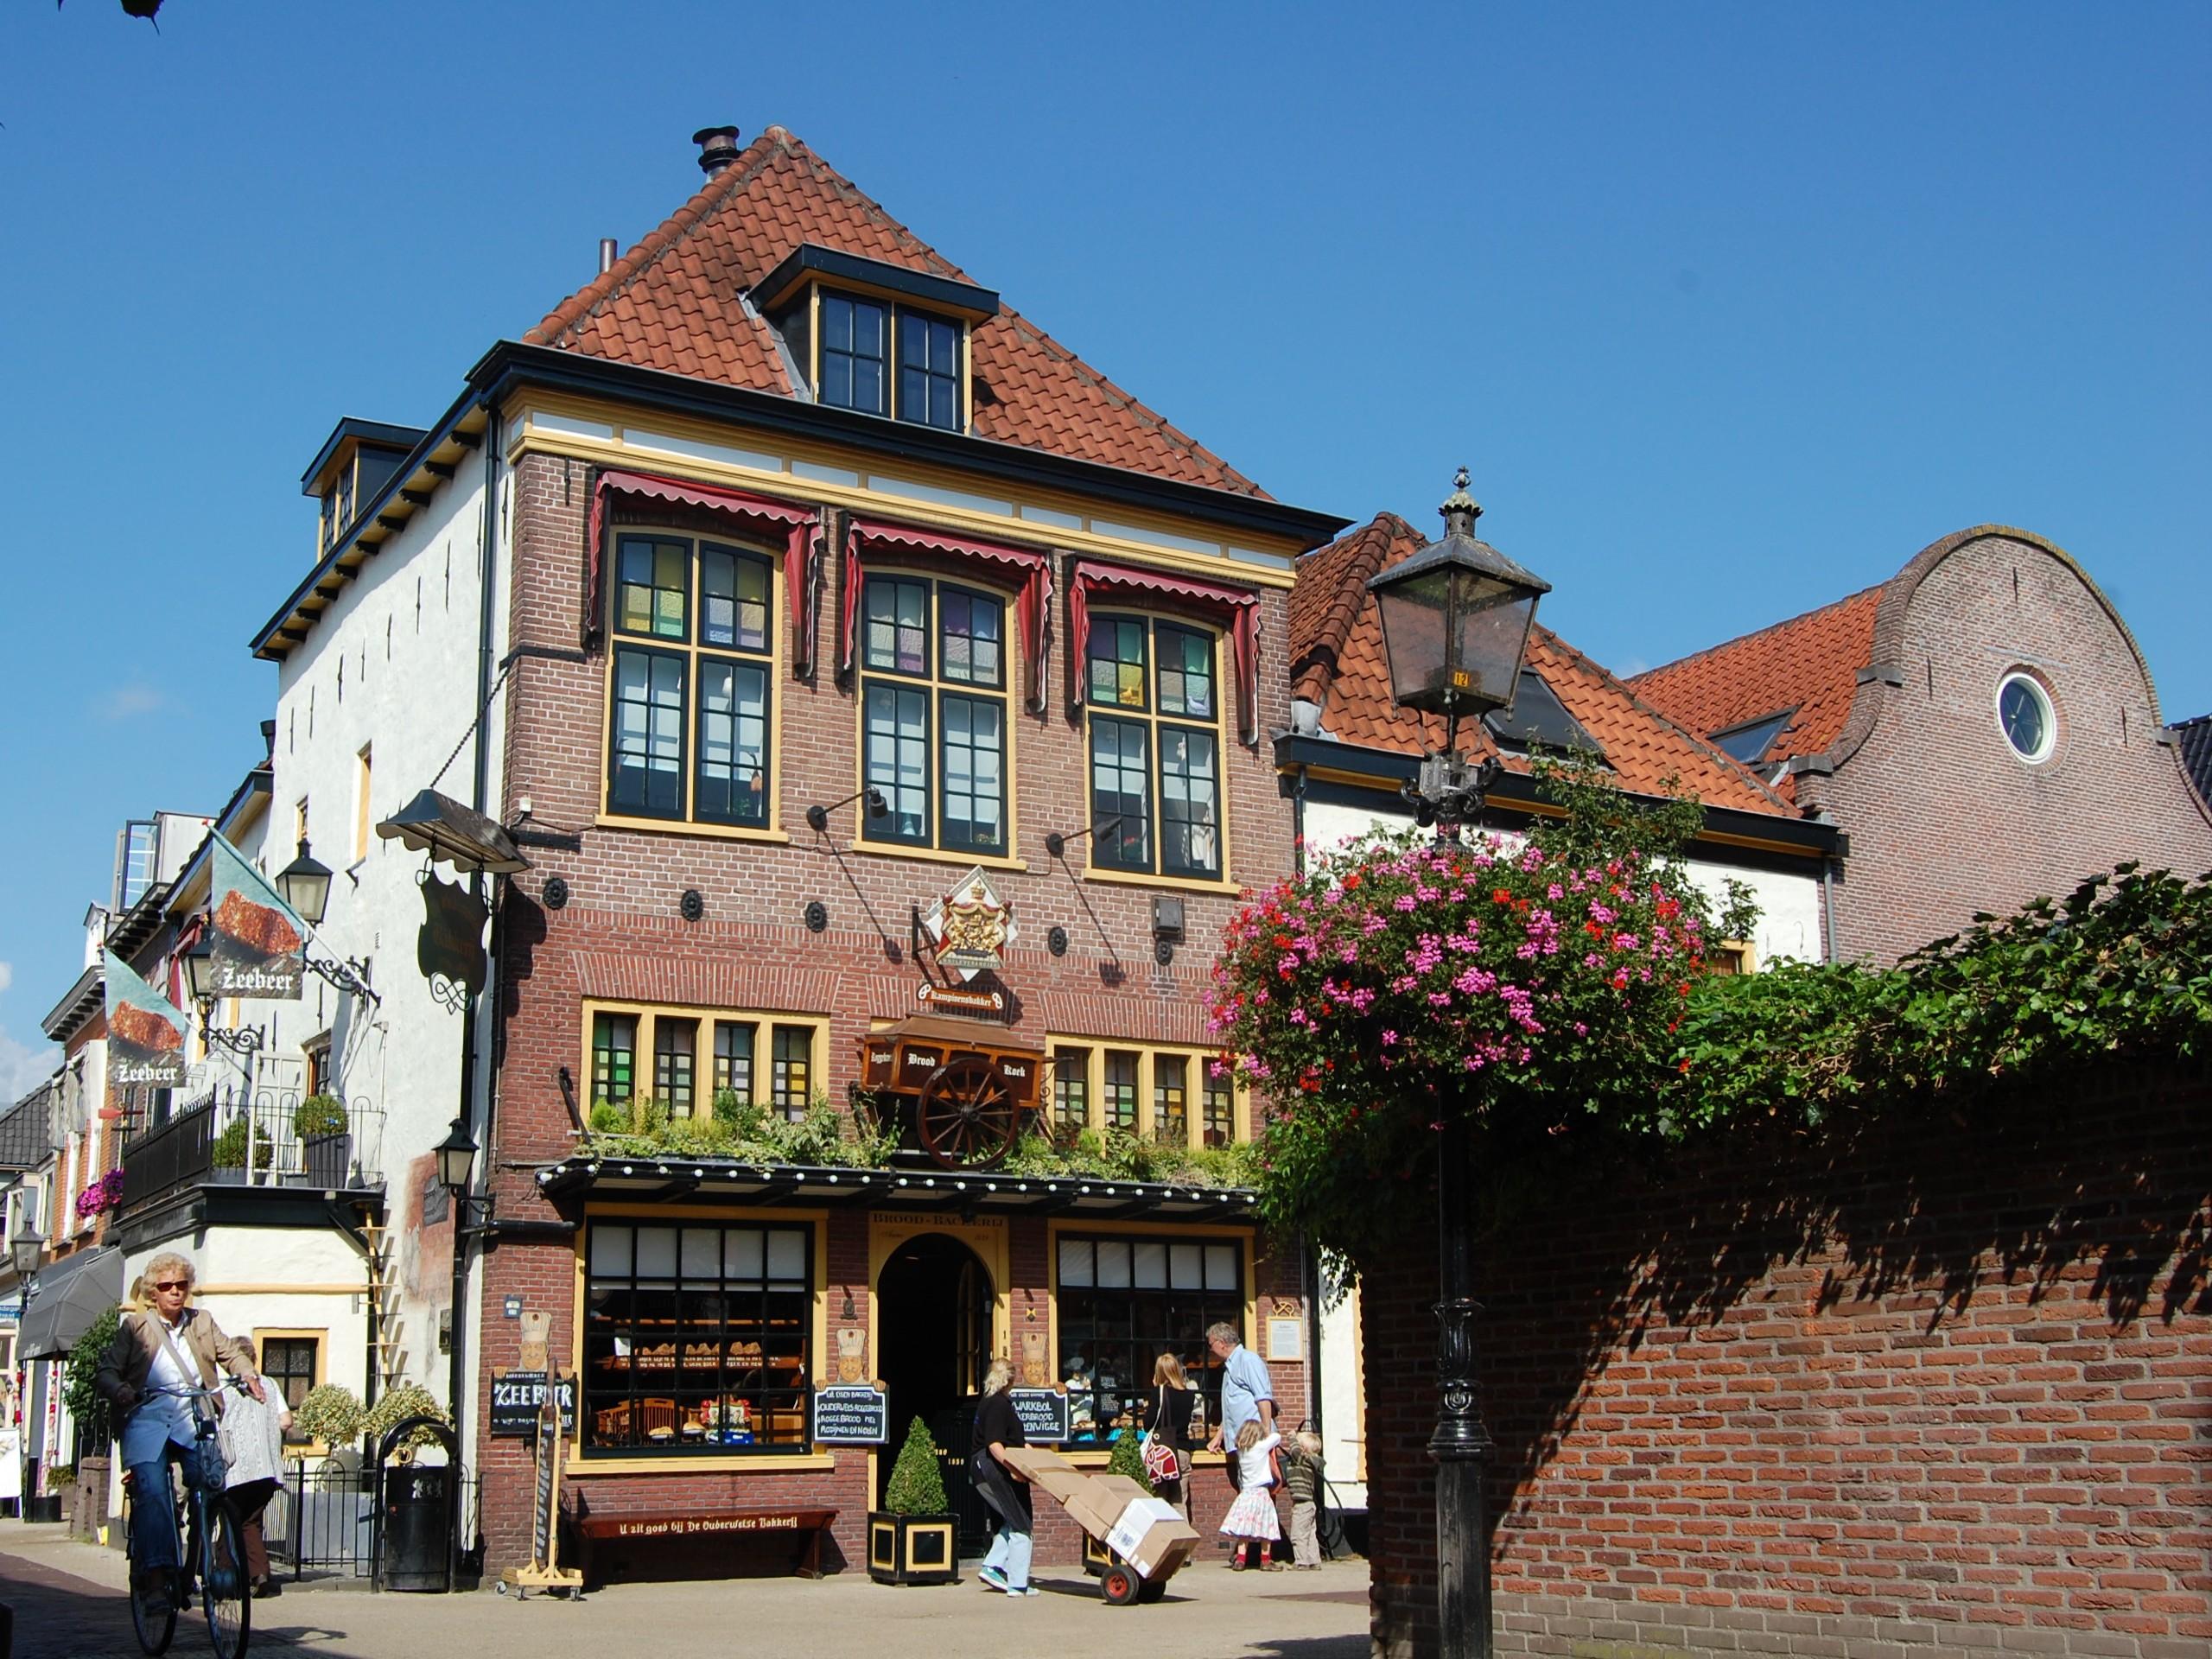 Colorful buildings in Harderwijk